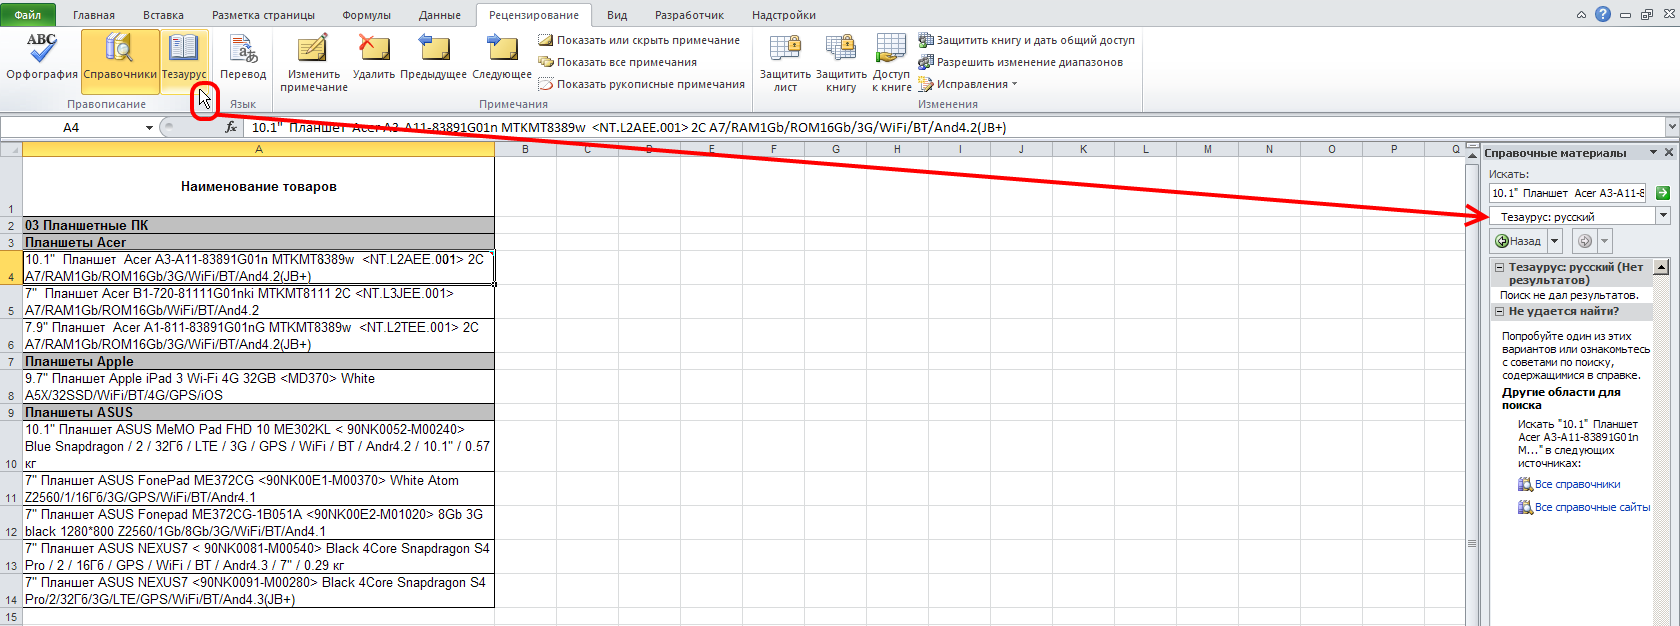 Excel: Рецензирование - Правописание - Тезаурус